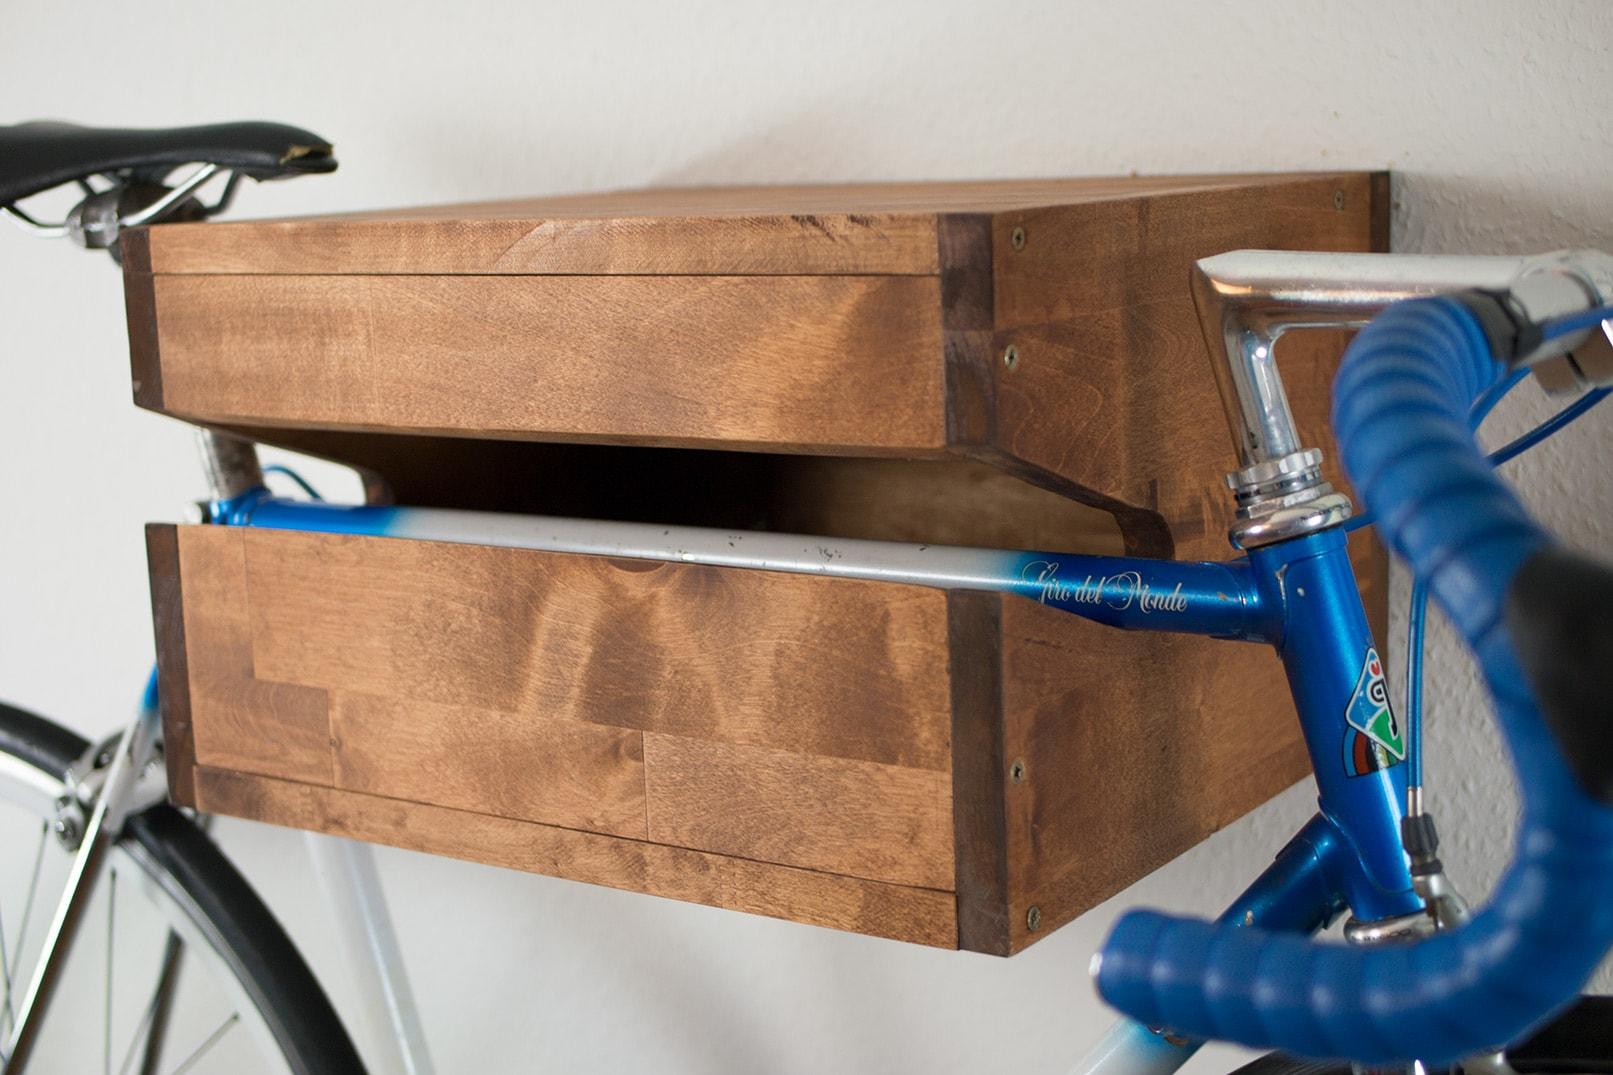 fahrrad wandhalterung selber bauen anleitung fotos. Black Bedroom Furniture Sets. Home Design Ideas